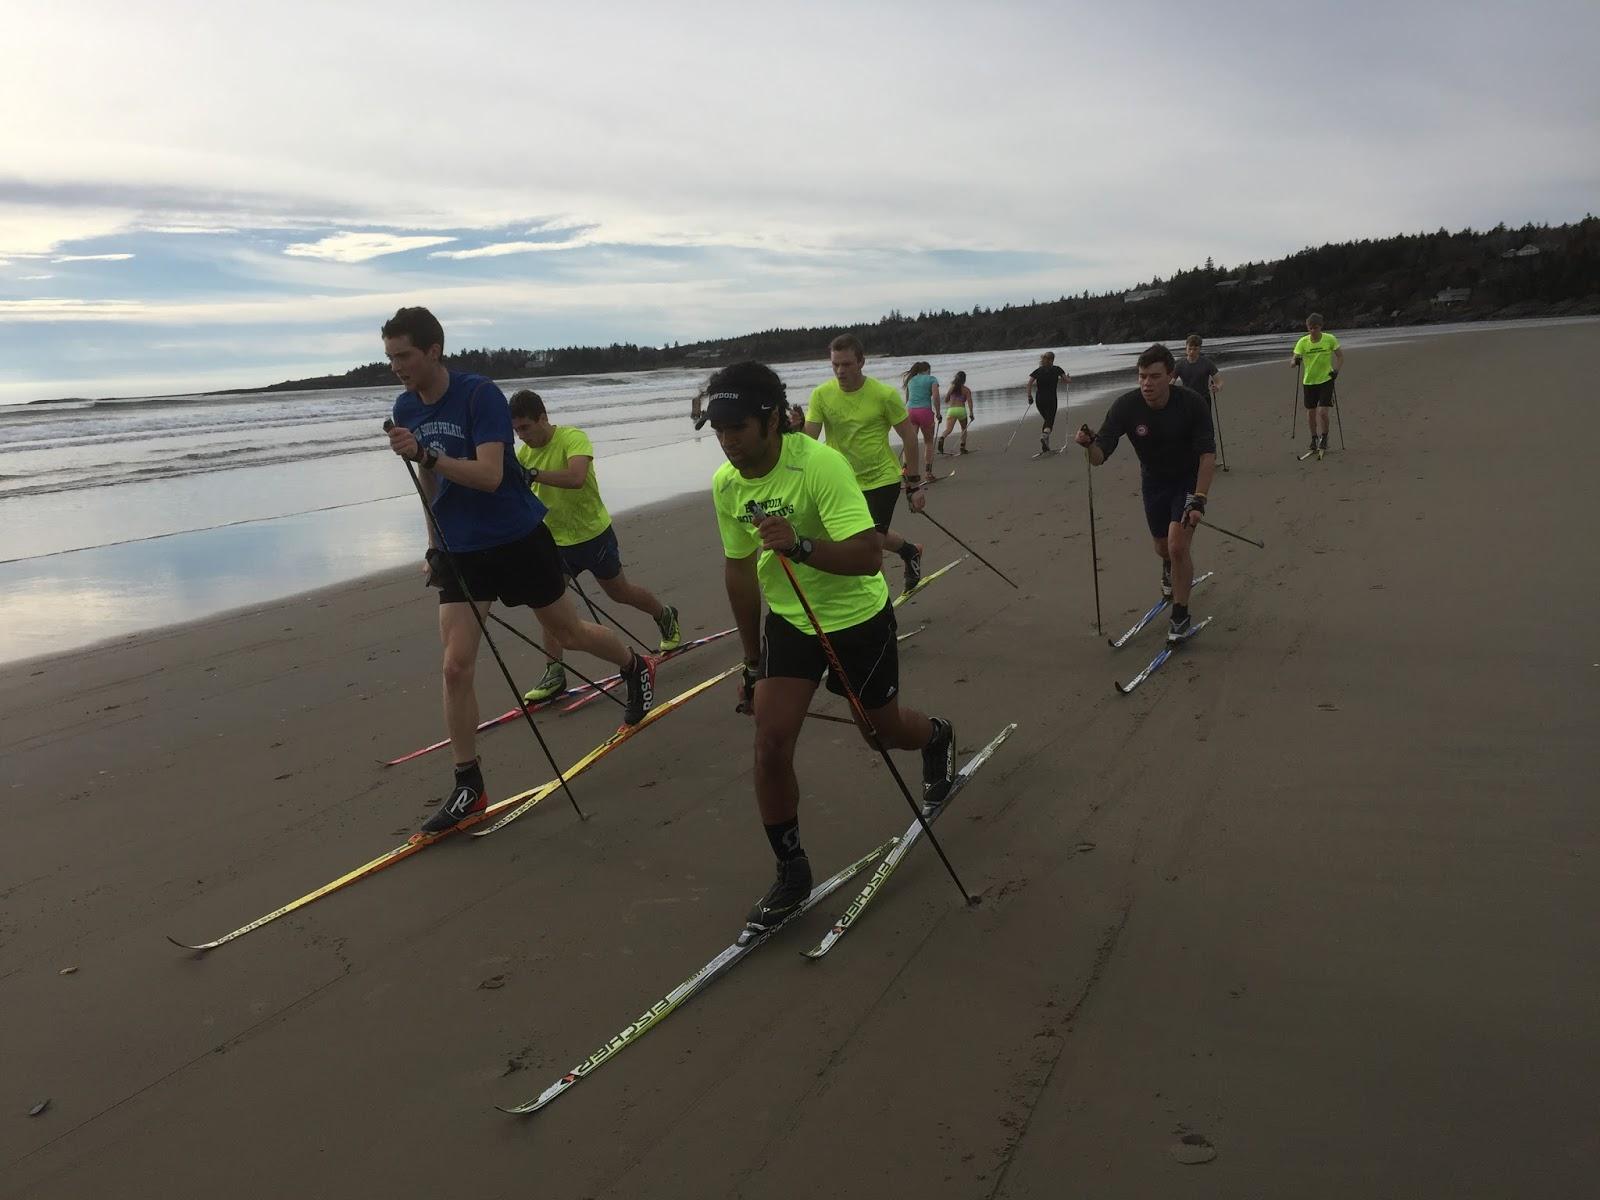 Bowdoin Nordic: Treadmill, Beach Skiing, & Lobster Roll